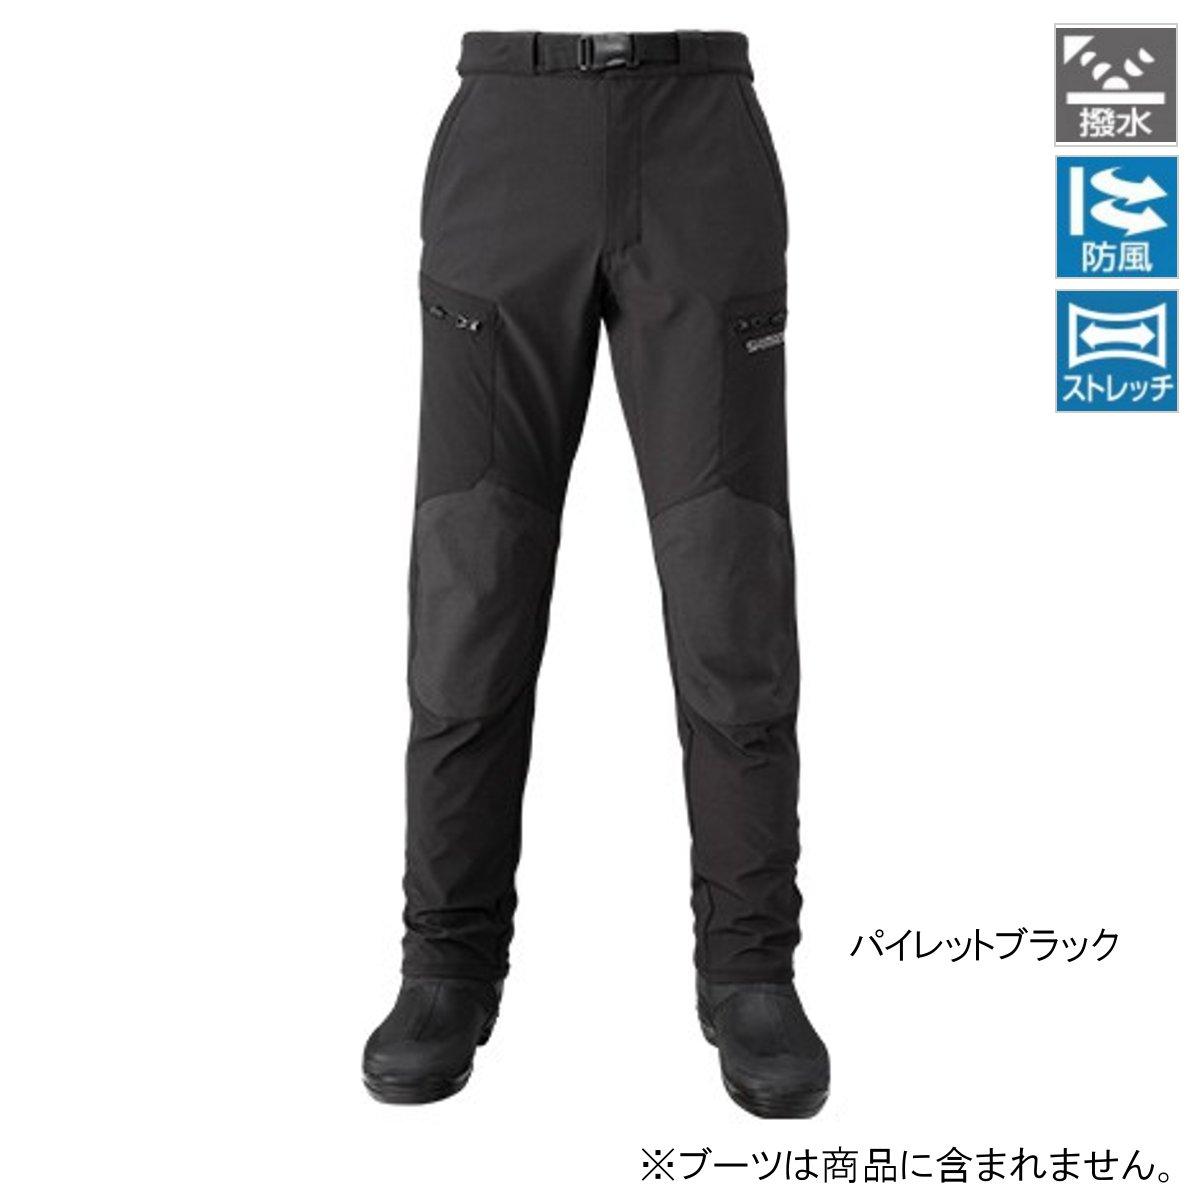 SHIMANO storm stretch pants PA-045Q L pie let black